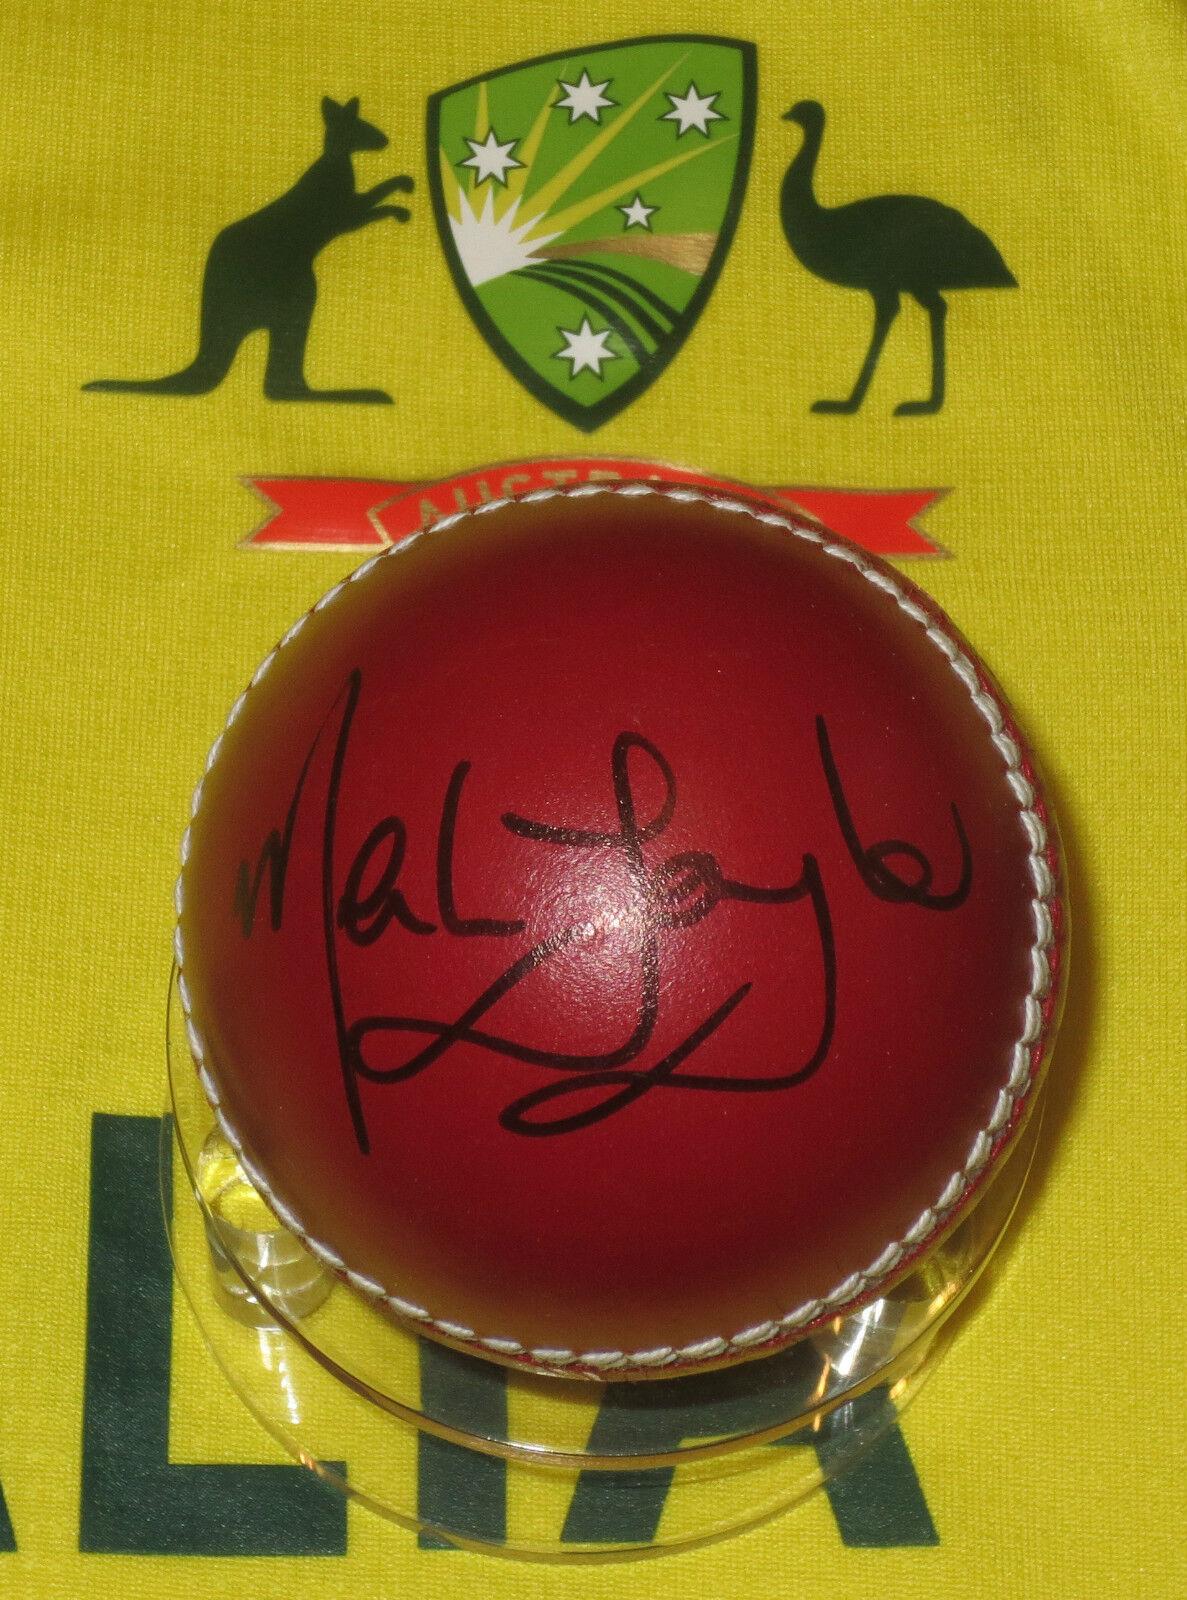 Mark Taylor Firmado pelota de cricket Sin Marco + Foto prueba & C.o.a